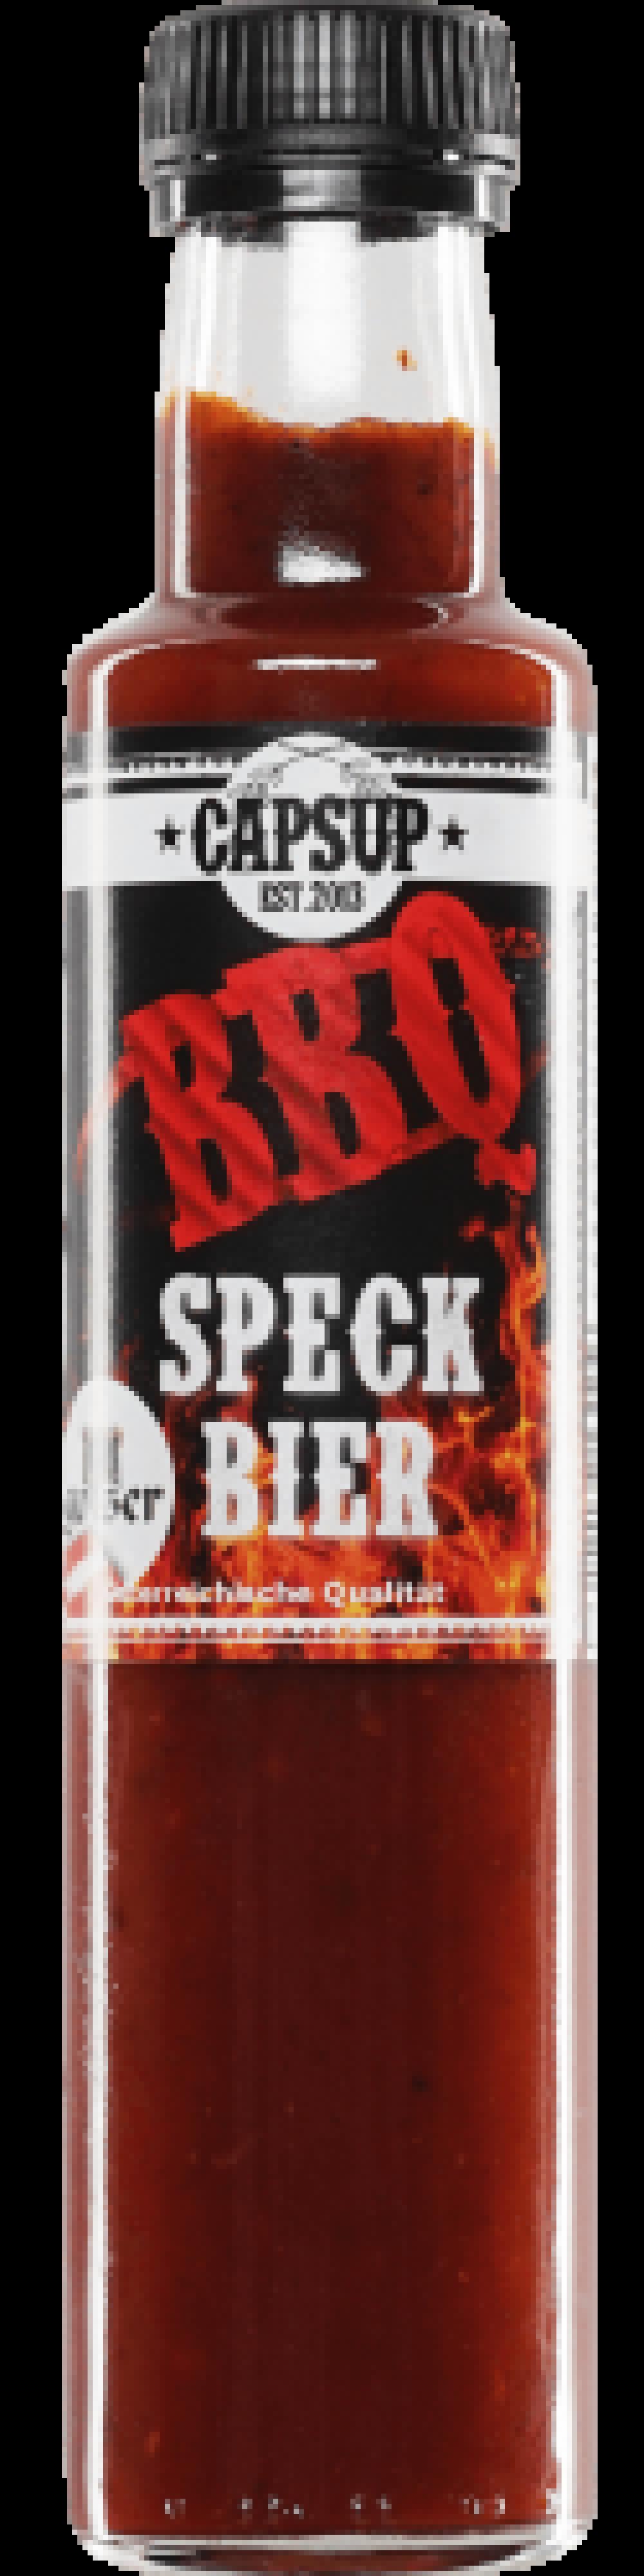 BBQ Speck Bier, 250ml, 4/10